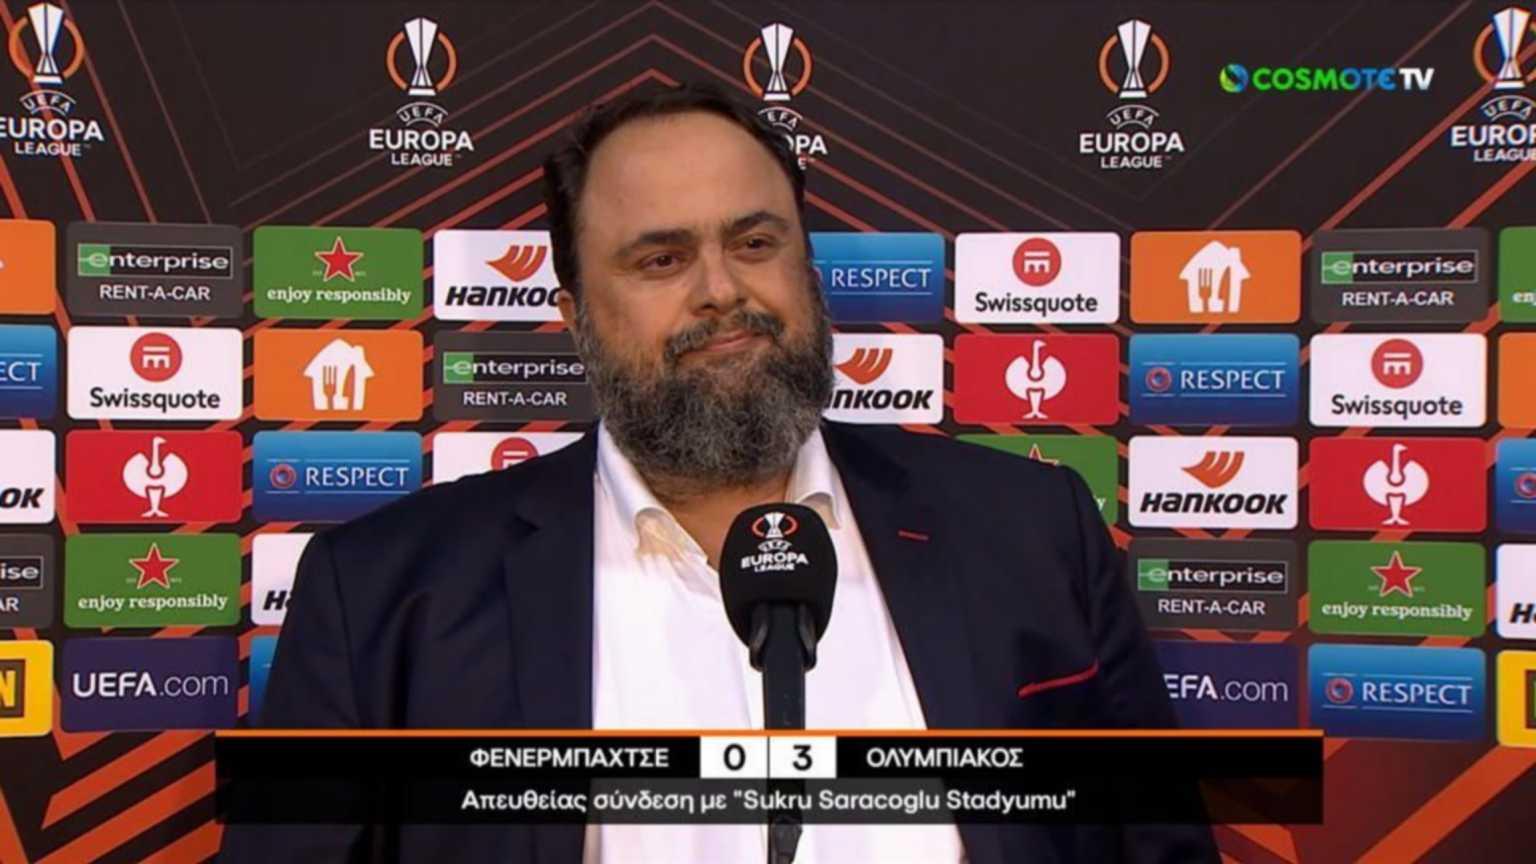 Europa League, Ολυμπιακός – Βαγγέλης Μαρινάκης: «Αφιερωμένη στους Έλληνες η νίκη στην Πόλη μας»